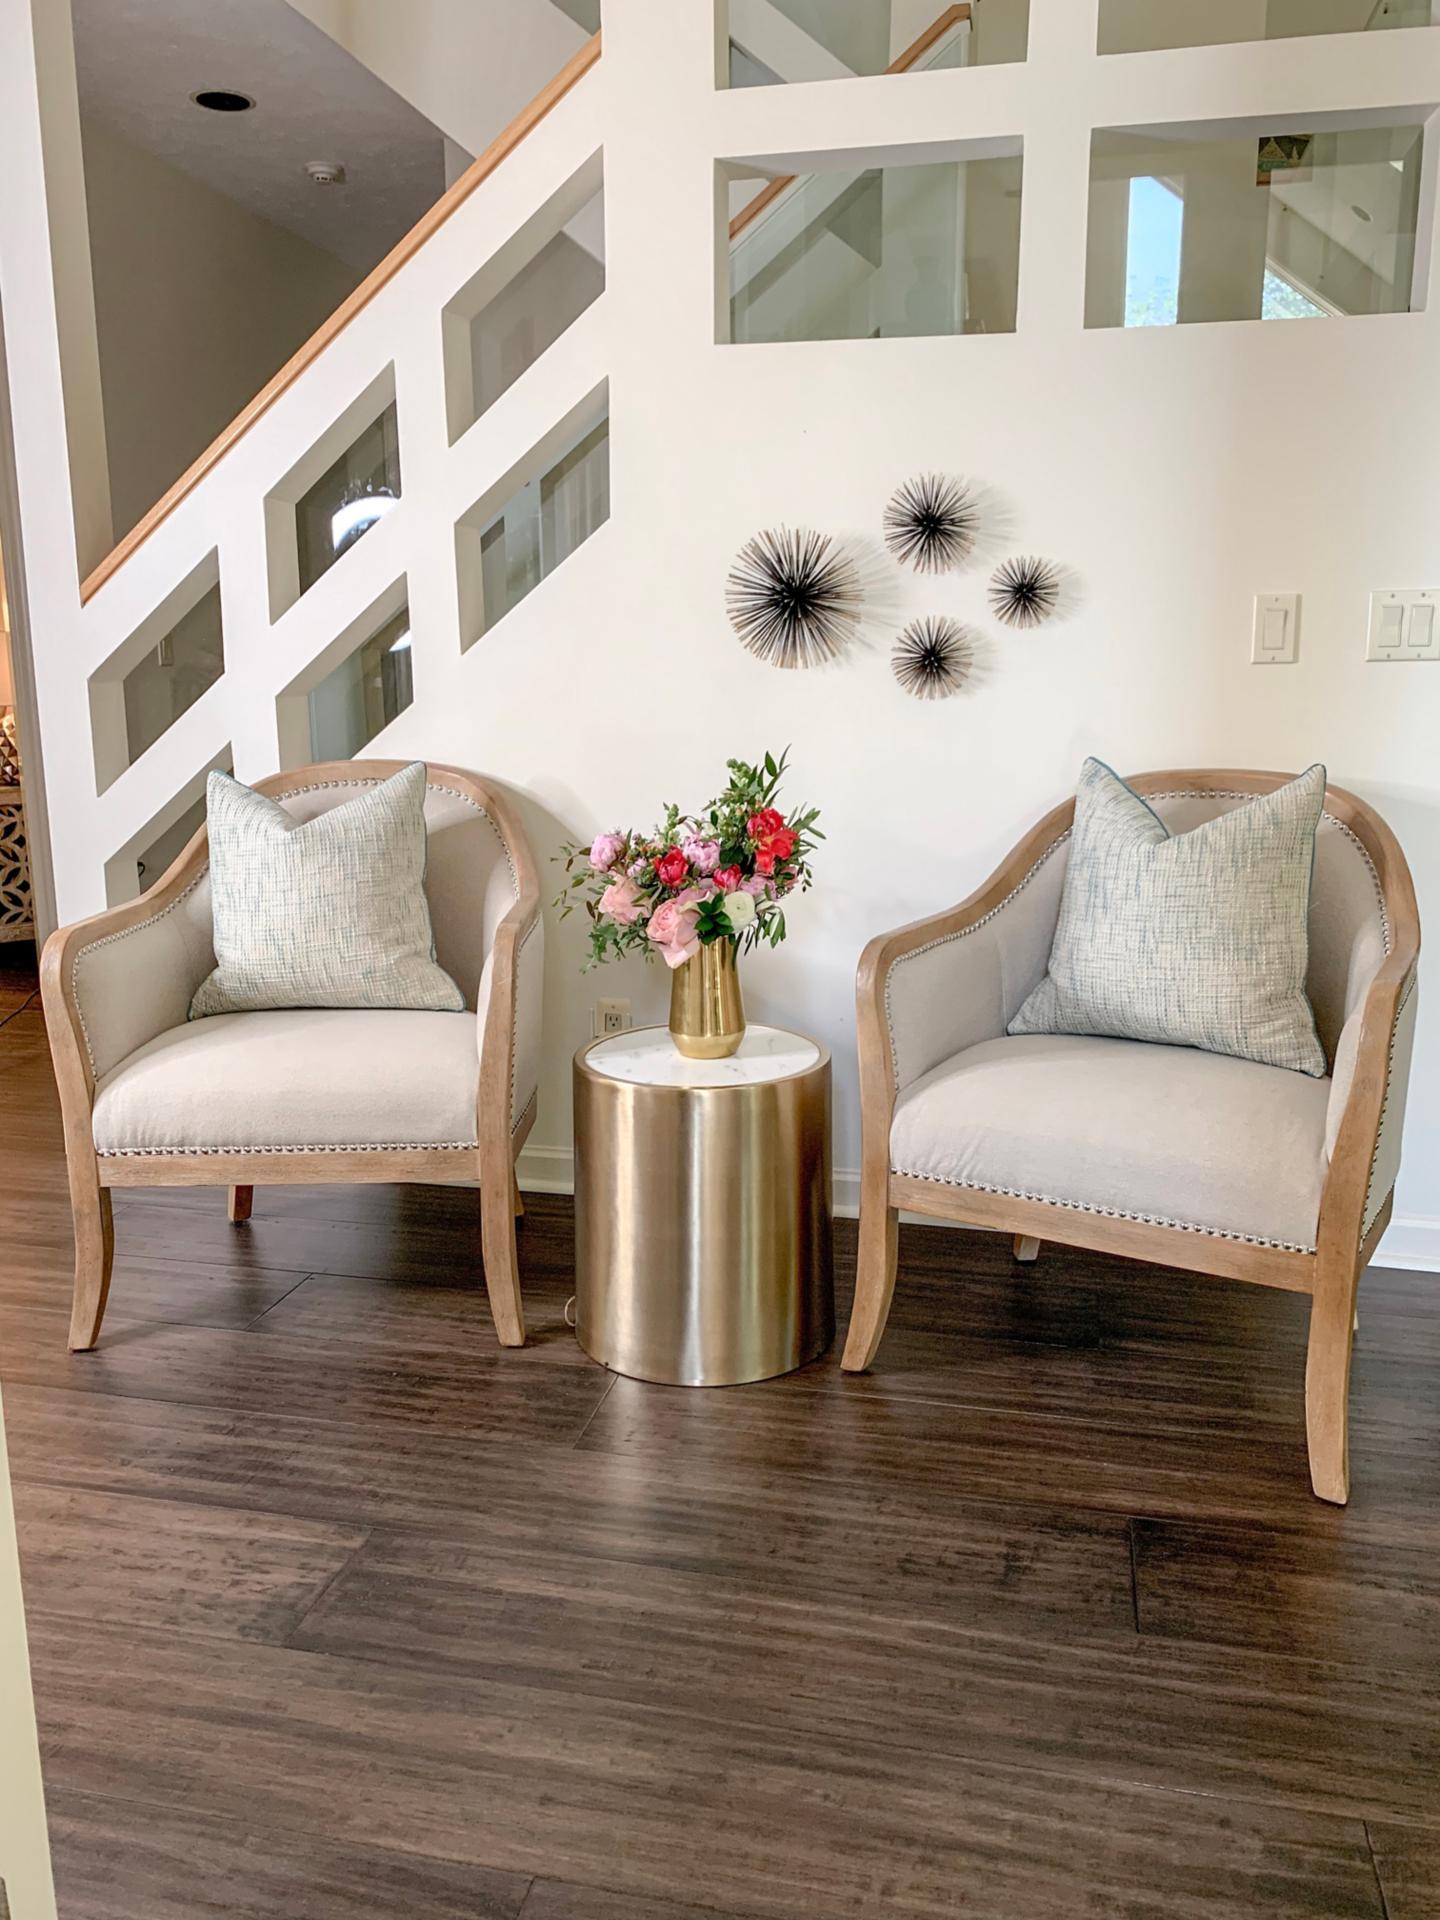 farahjmerhi style insider inspiration room makeover image 06